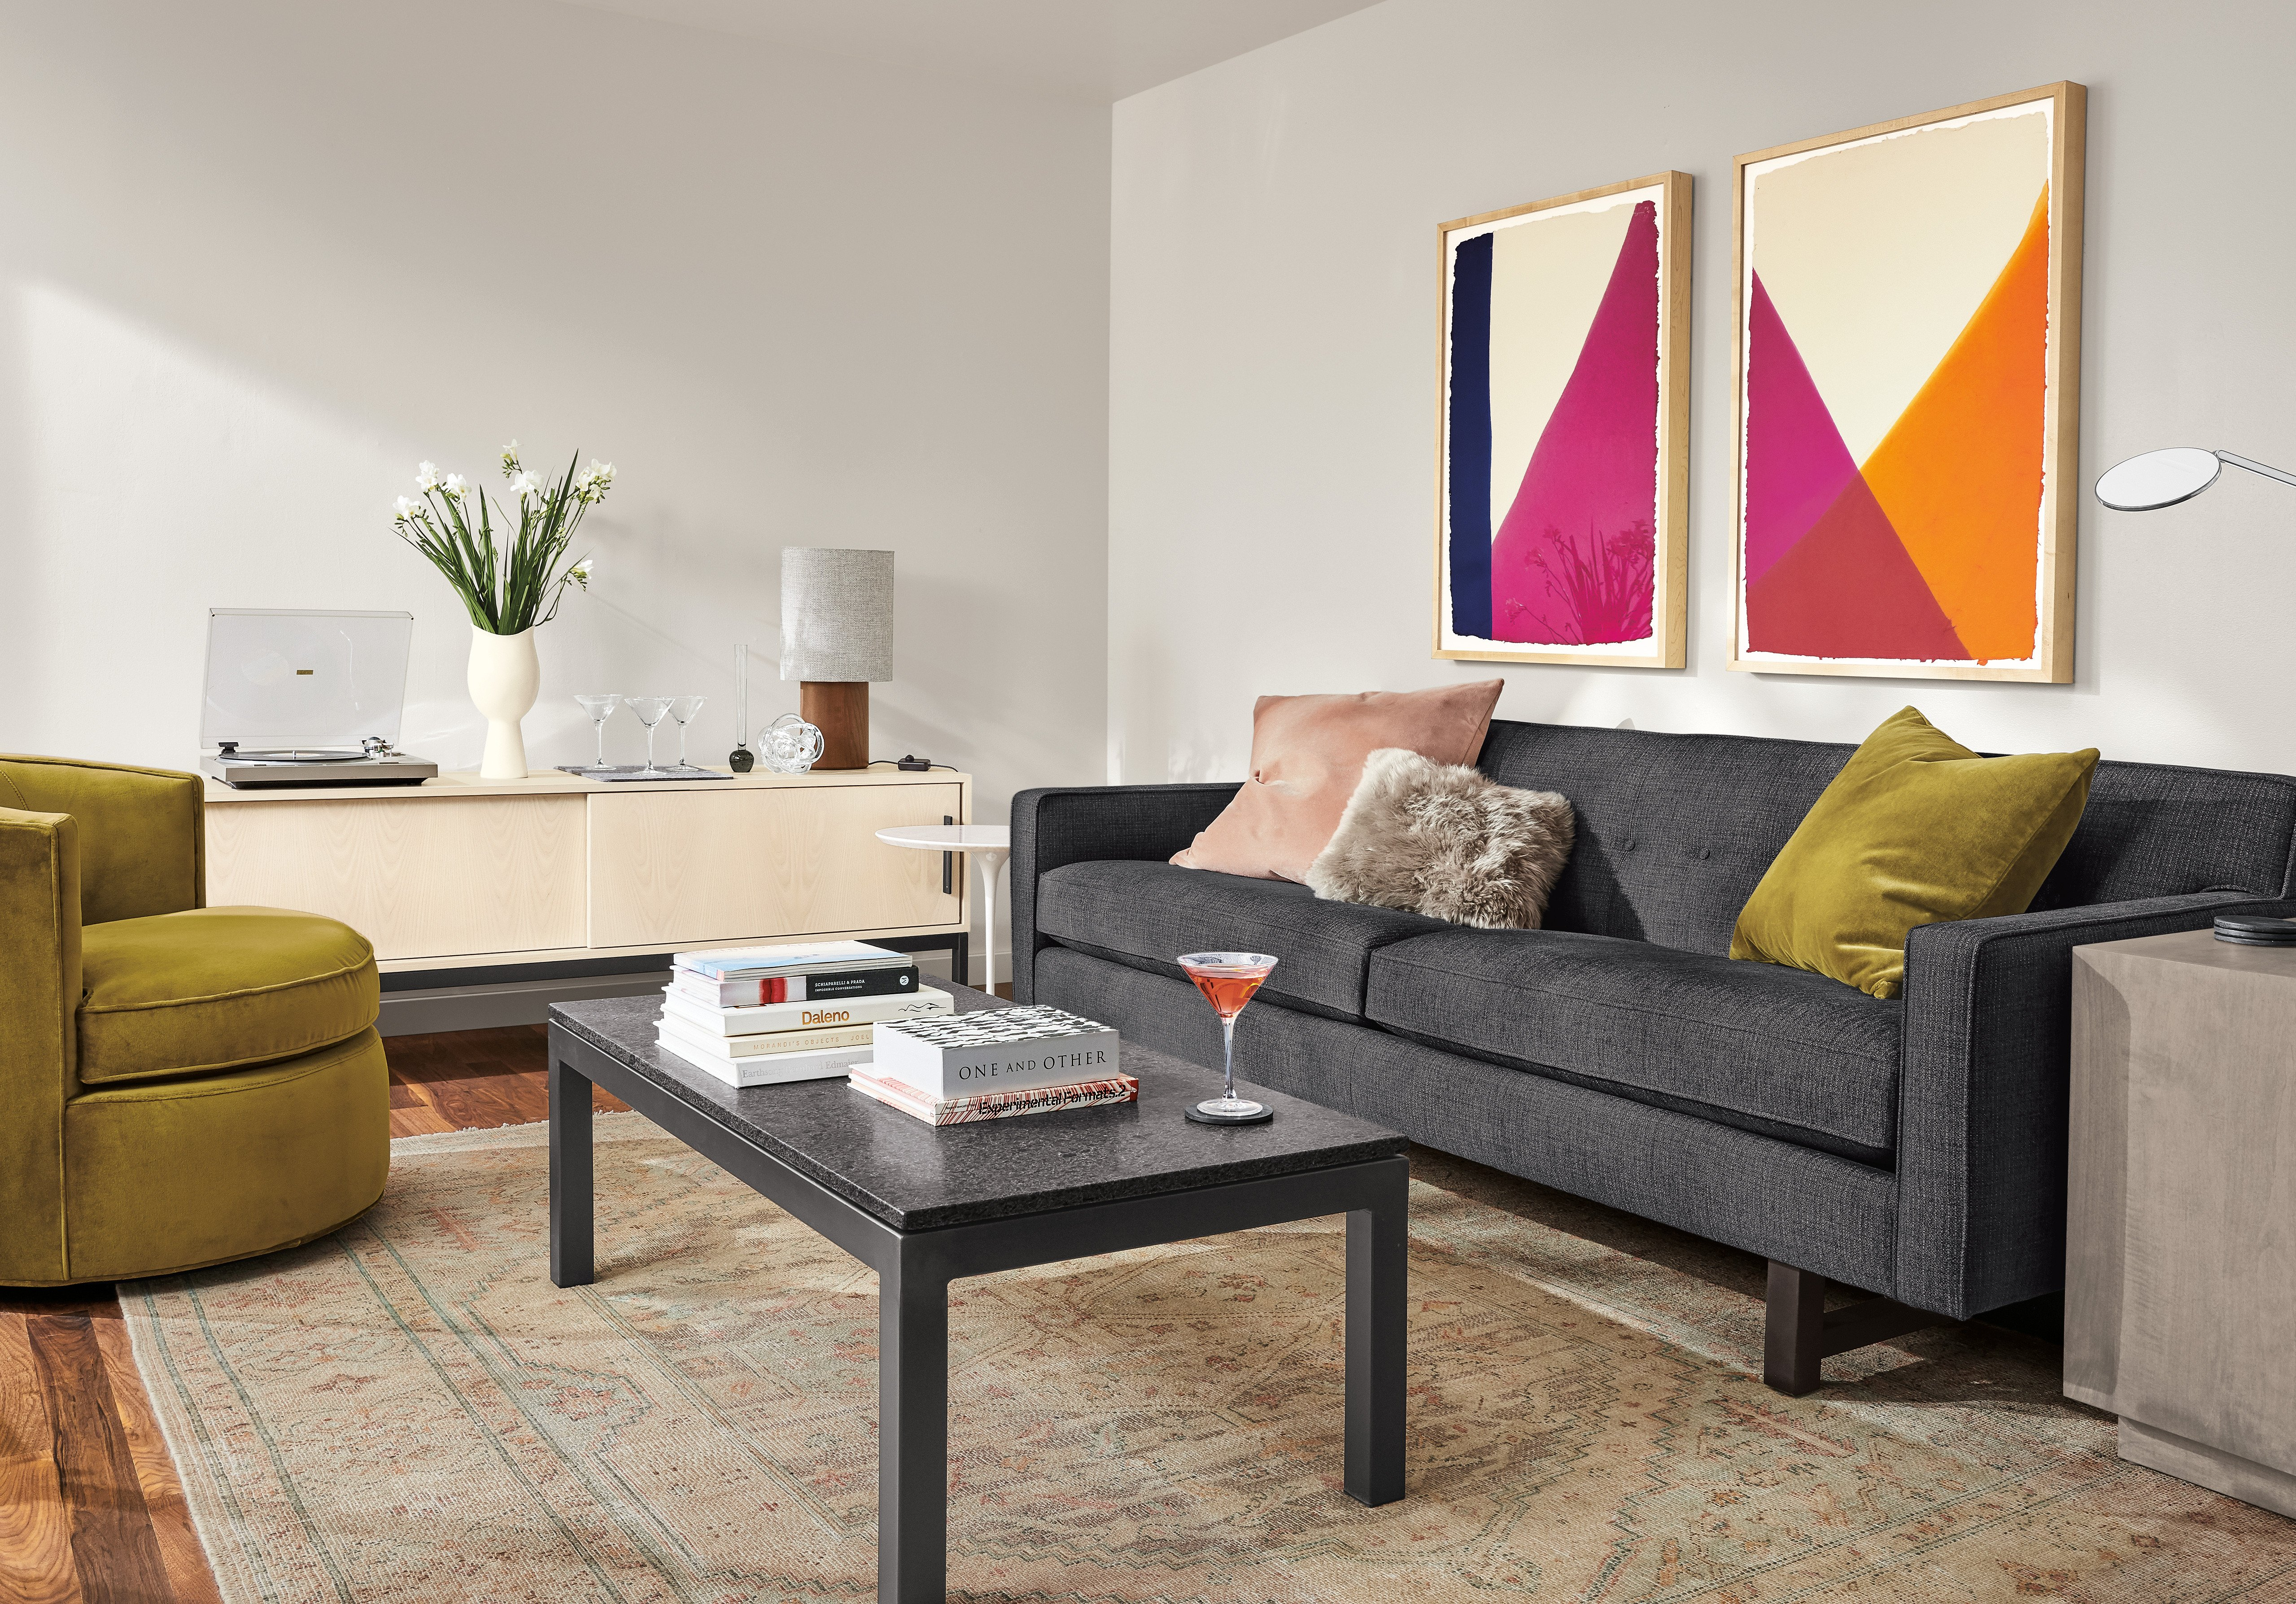 Small Living Room Decor Ideas Luxury Decorating Ideas for A Small Living Room Room & Board